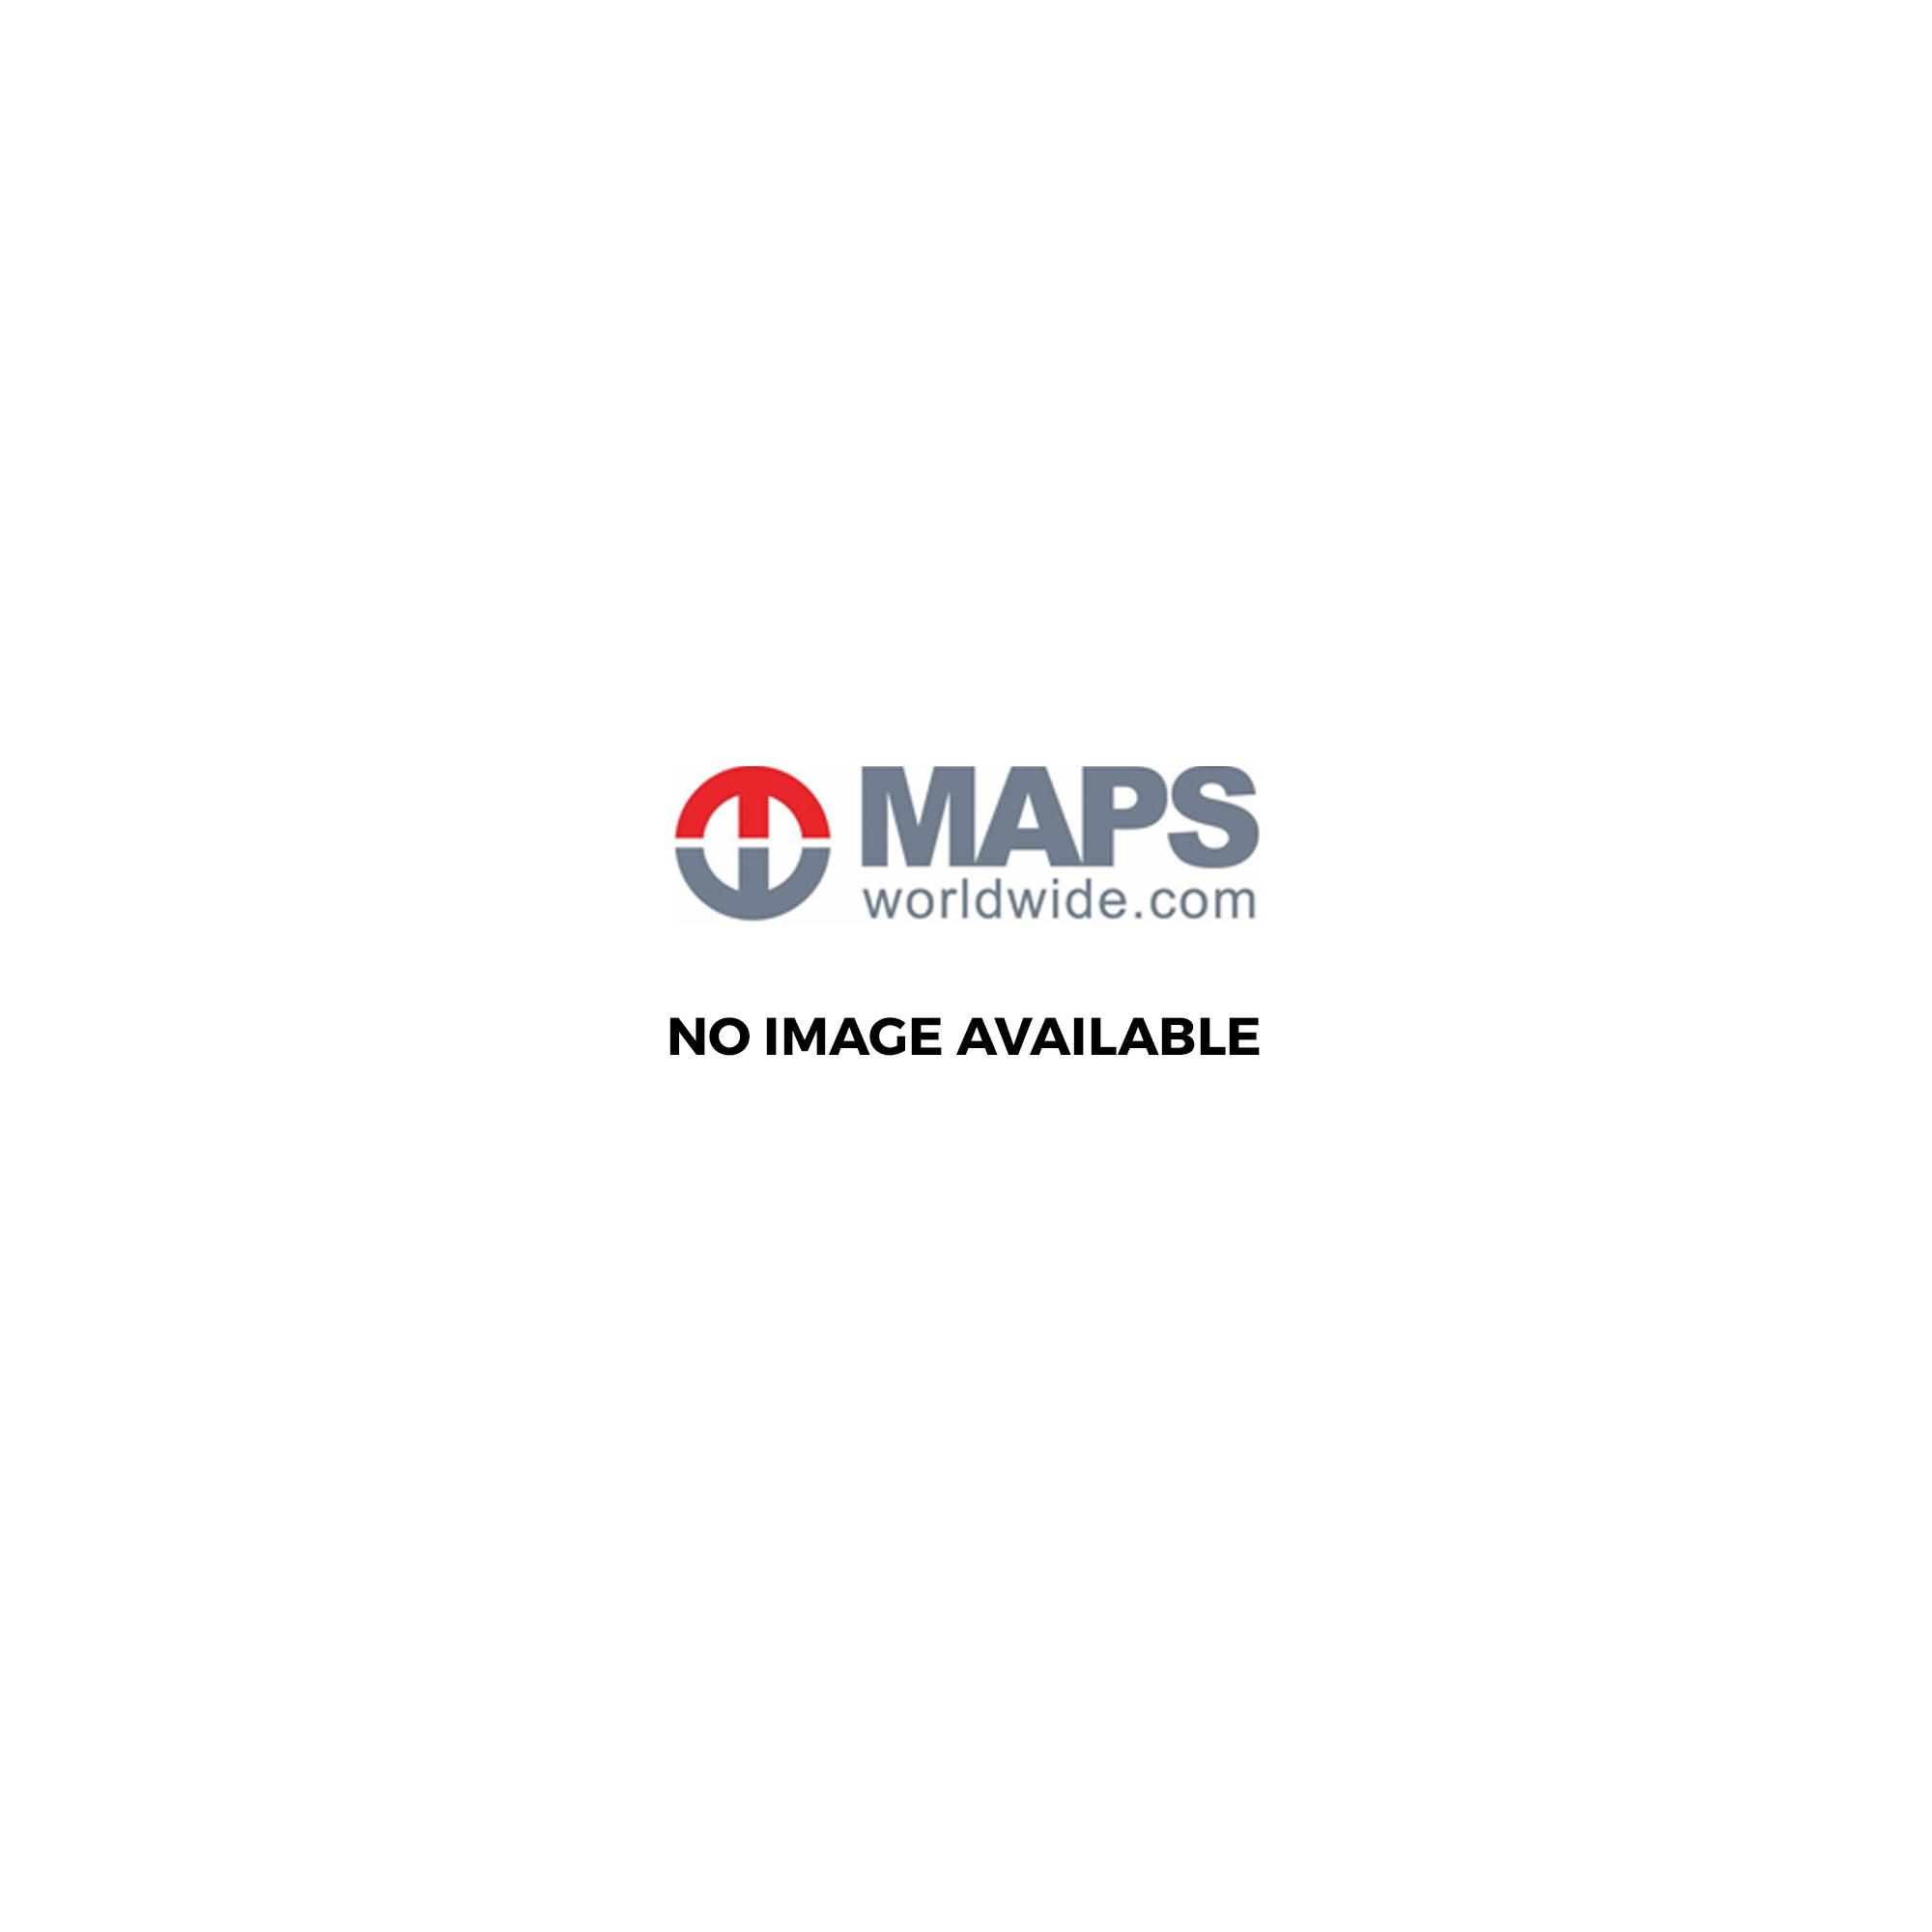 Wachau Karte Donau.Waldviertel Kamptal Wachau 2 Maps Kompass Hiking Map 203